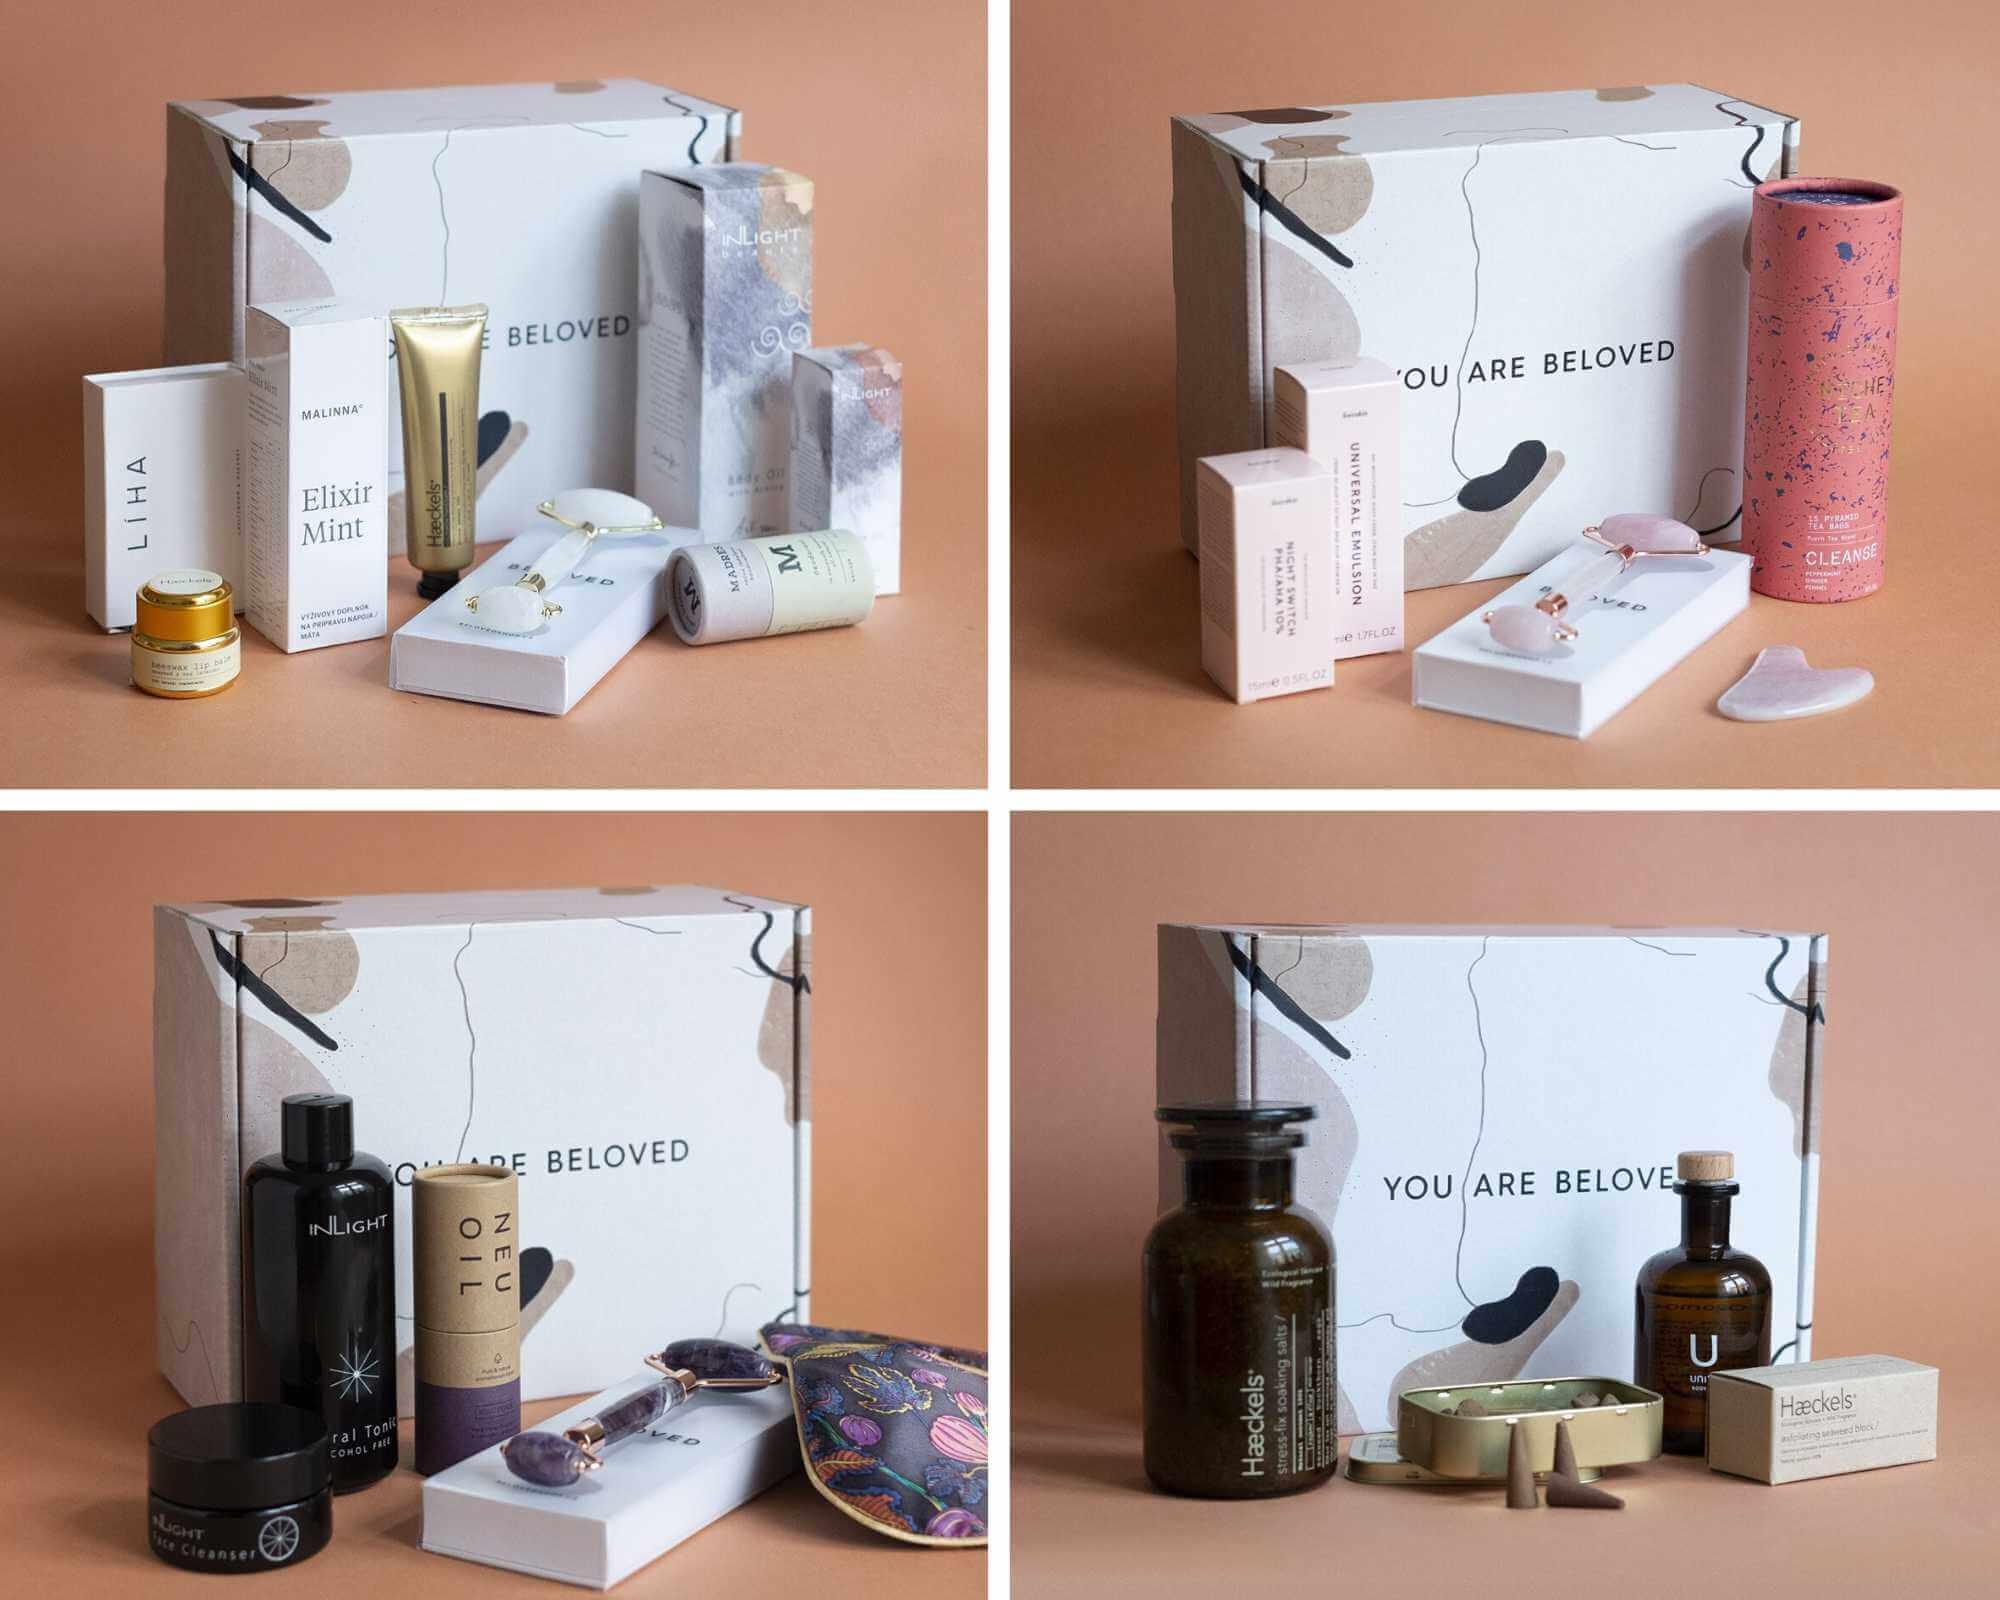 Imballaggi Beloved Shop x Packhelp su sfondo pastello